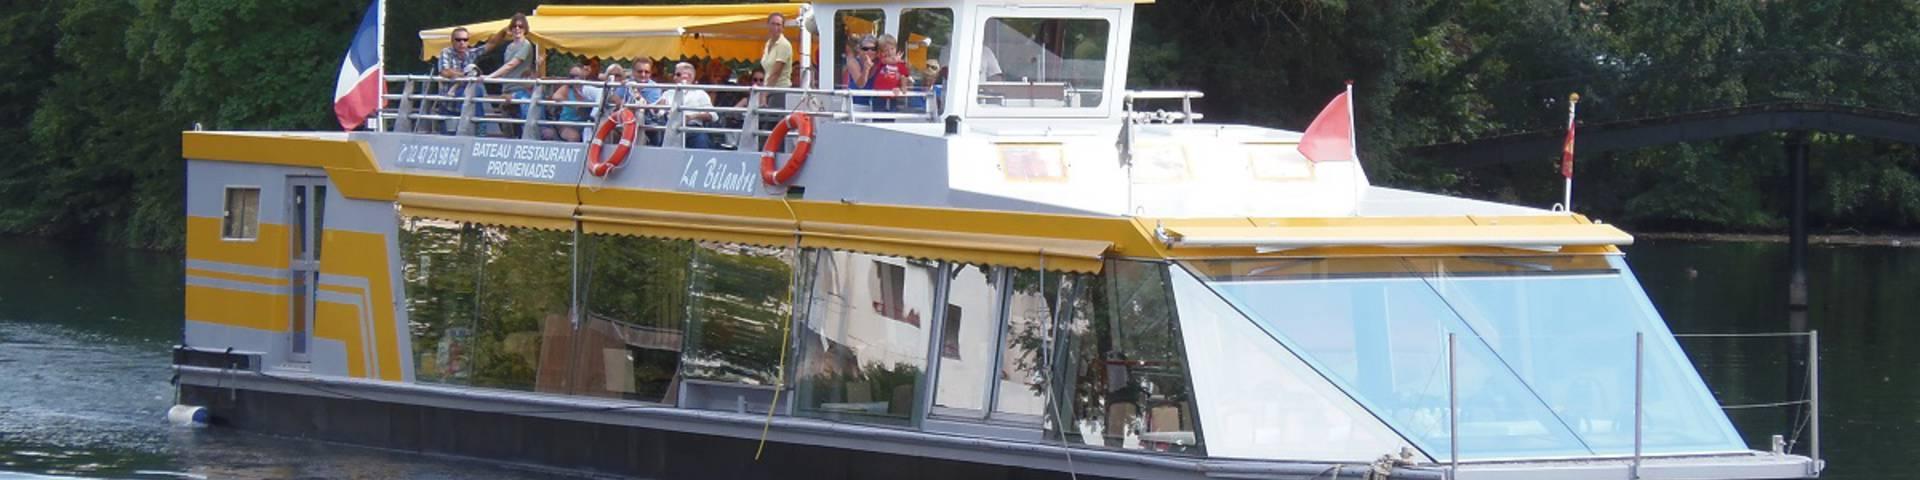 Kreuzfahrt auf der Cher mit La Bélandre. © OTBC